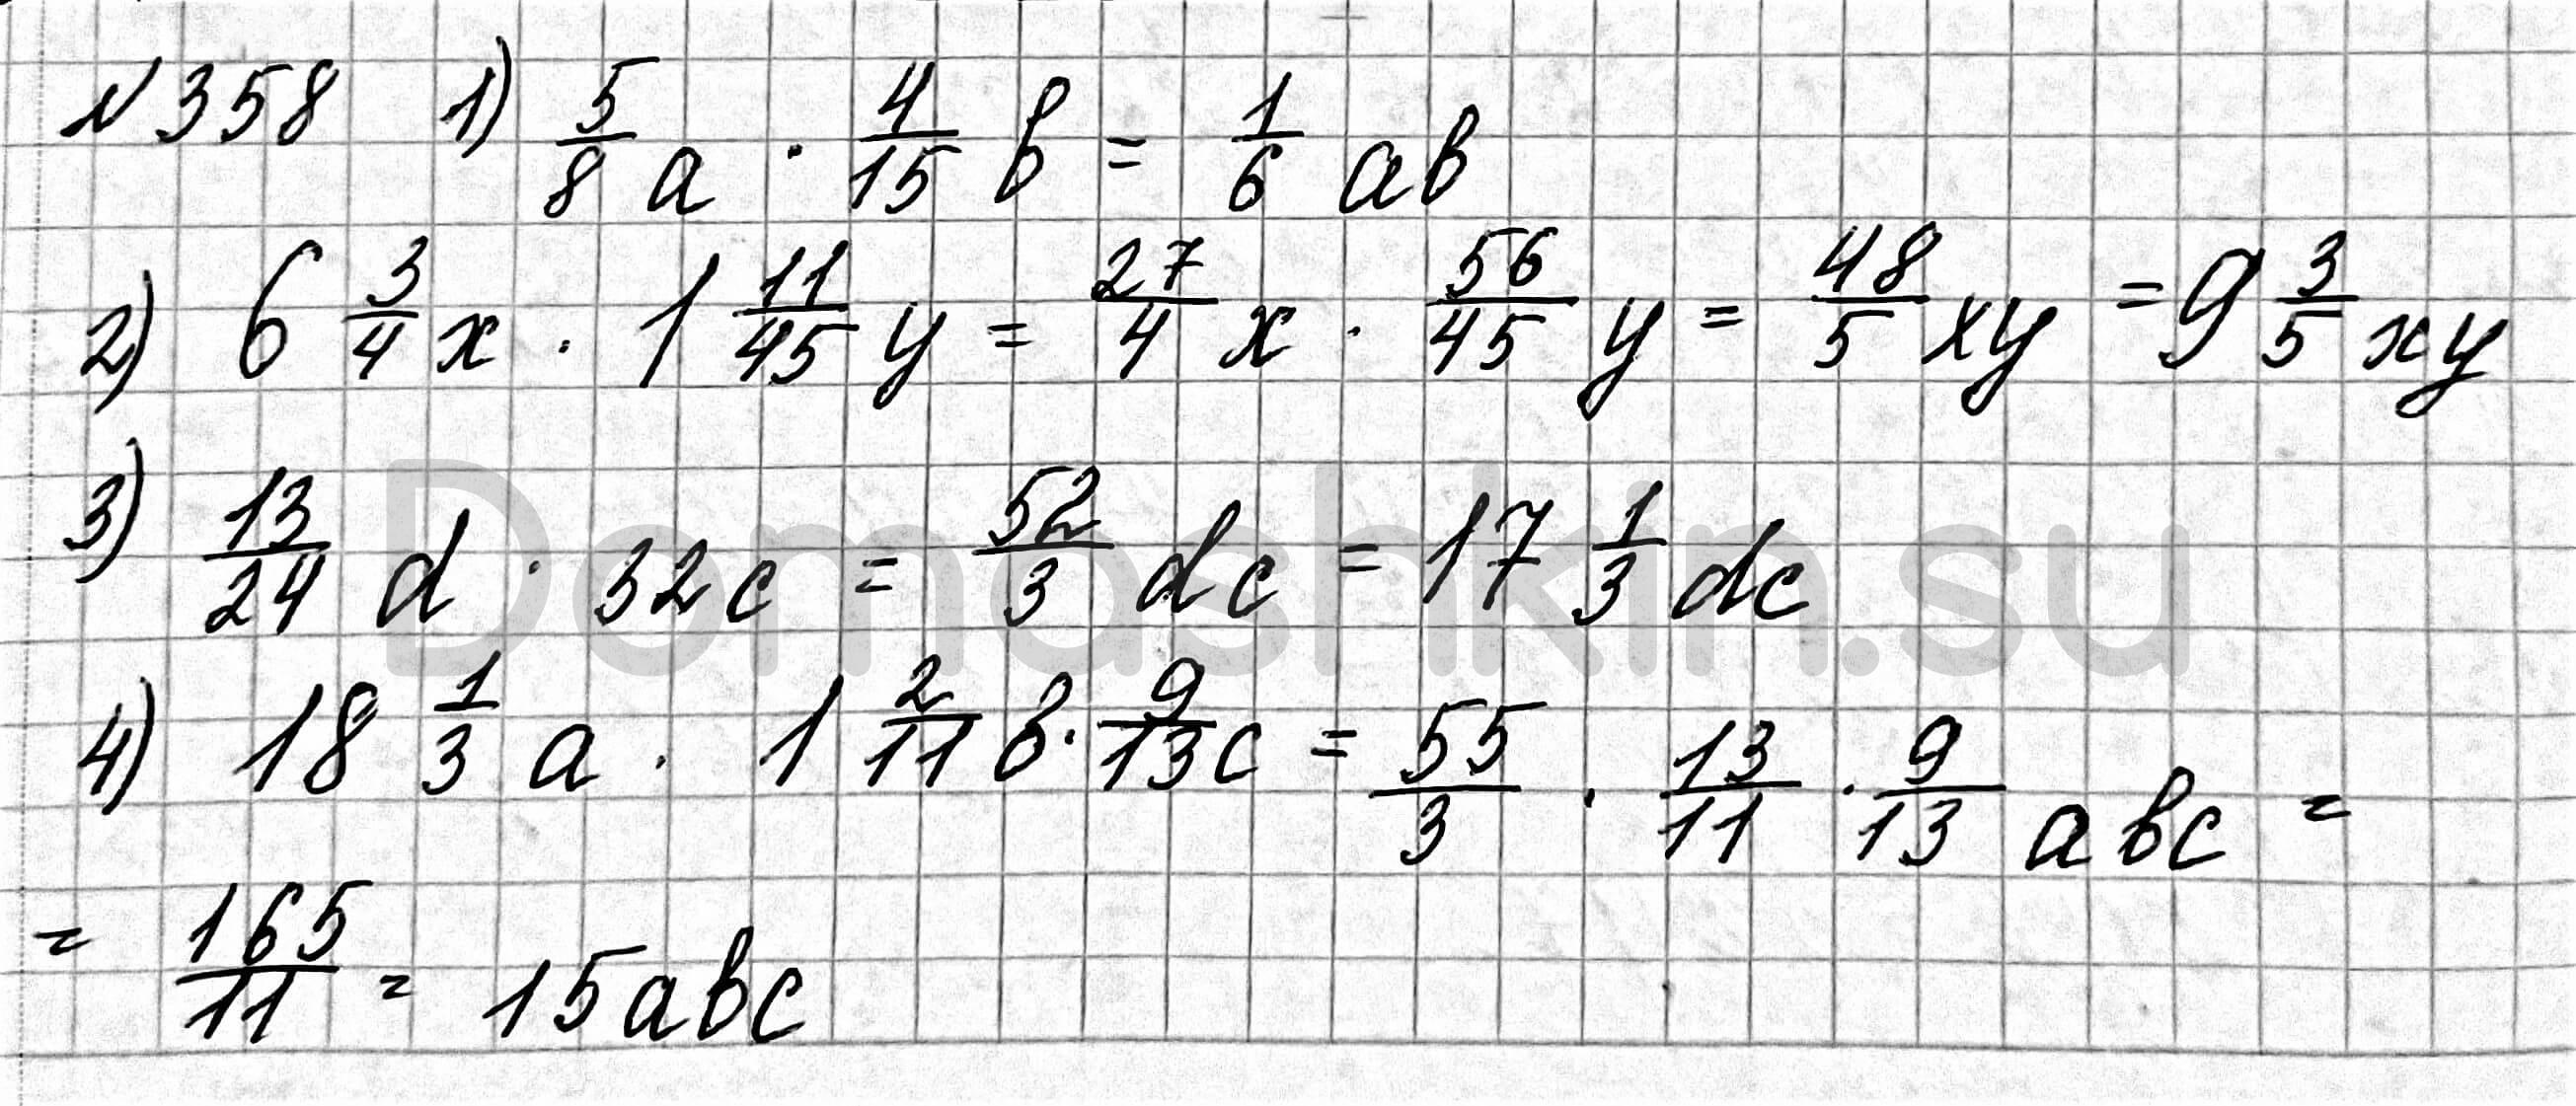 Математика 6 класс учебник Мерзляк номер 358 решение